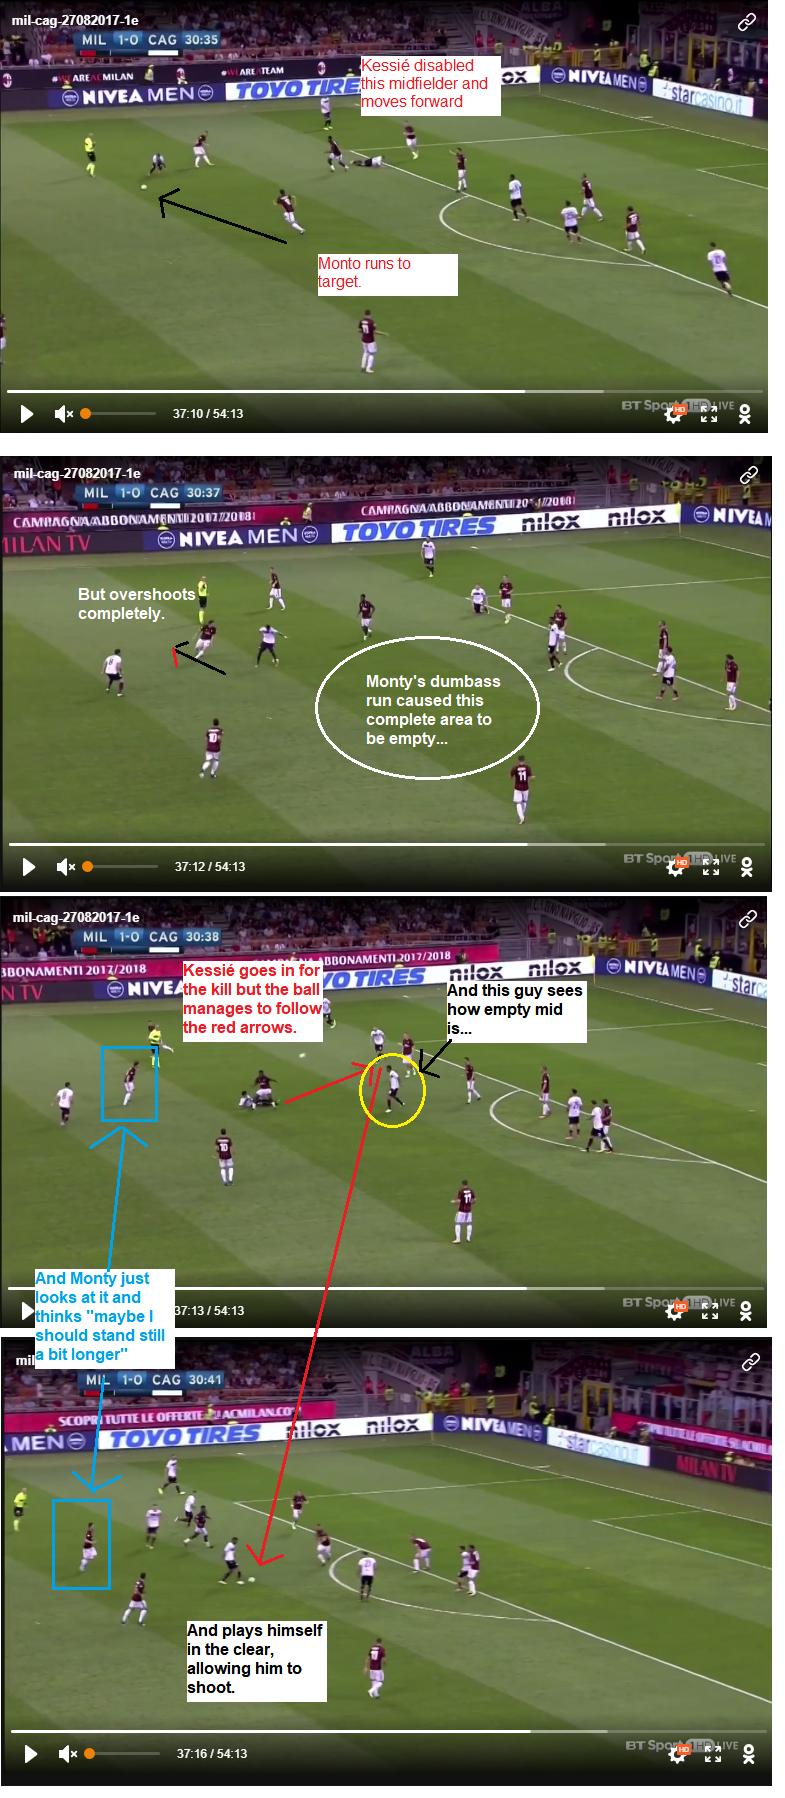 Analysis of Montolivo during Cagliari  [Warning: many images